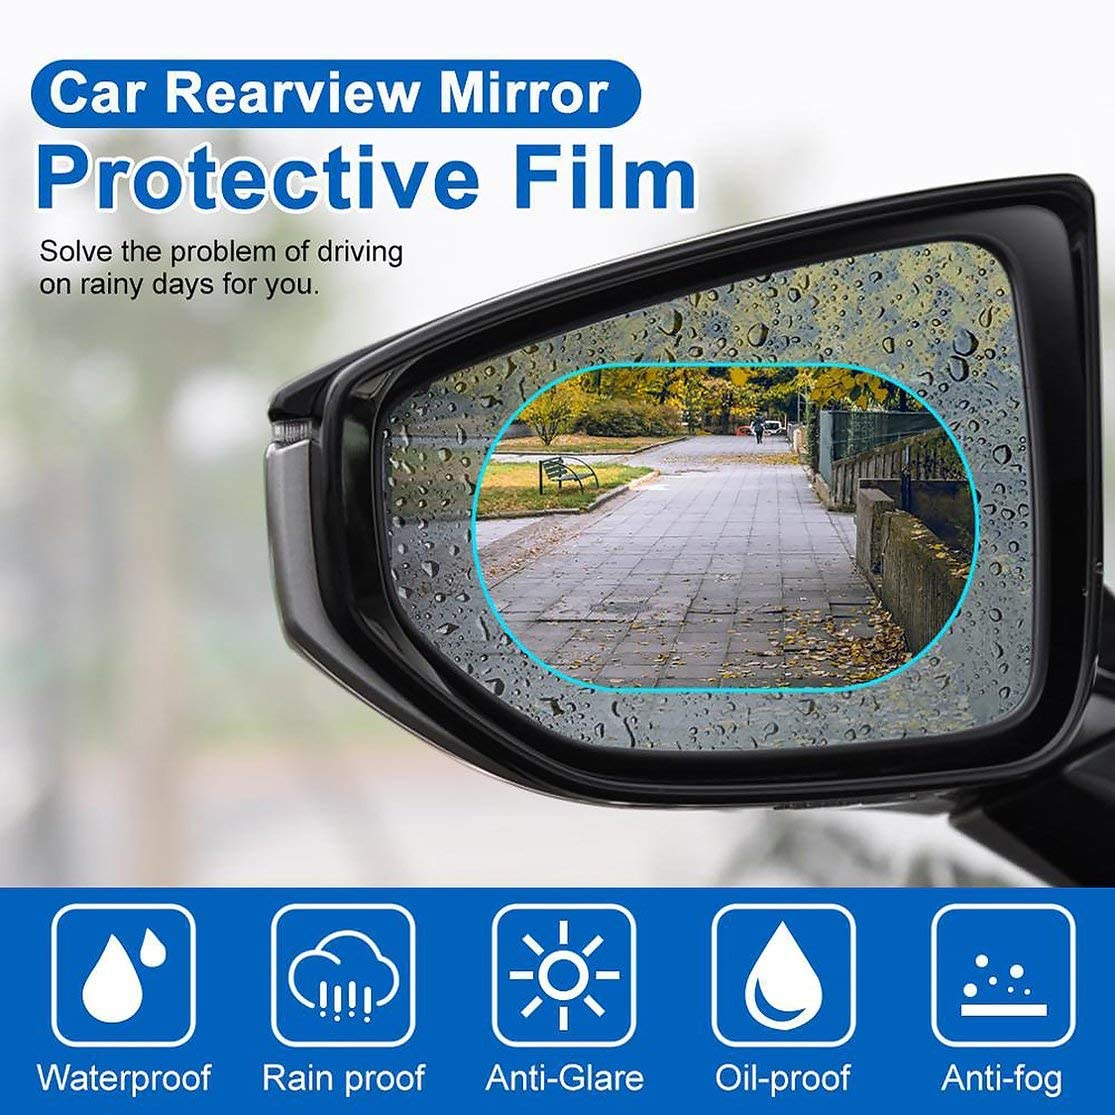 Candybarbar Car Rearview Mirror Rain Film Reversing Mirror Anti-Fog Stick Glass Waterproof Film Universal Side Window Hd Film